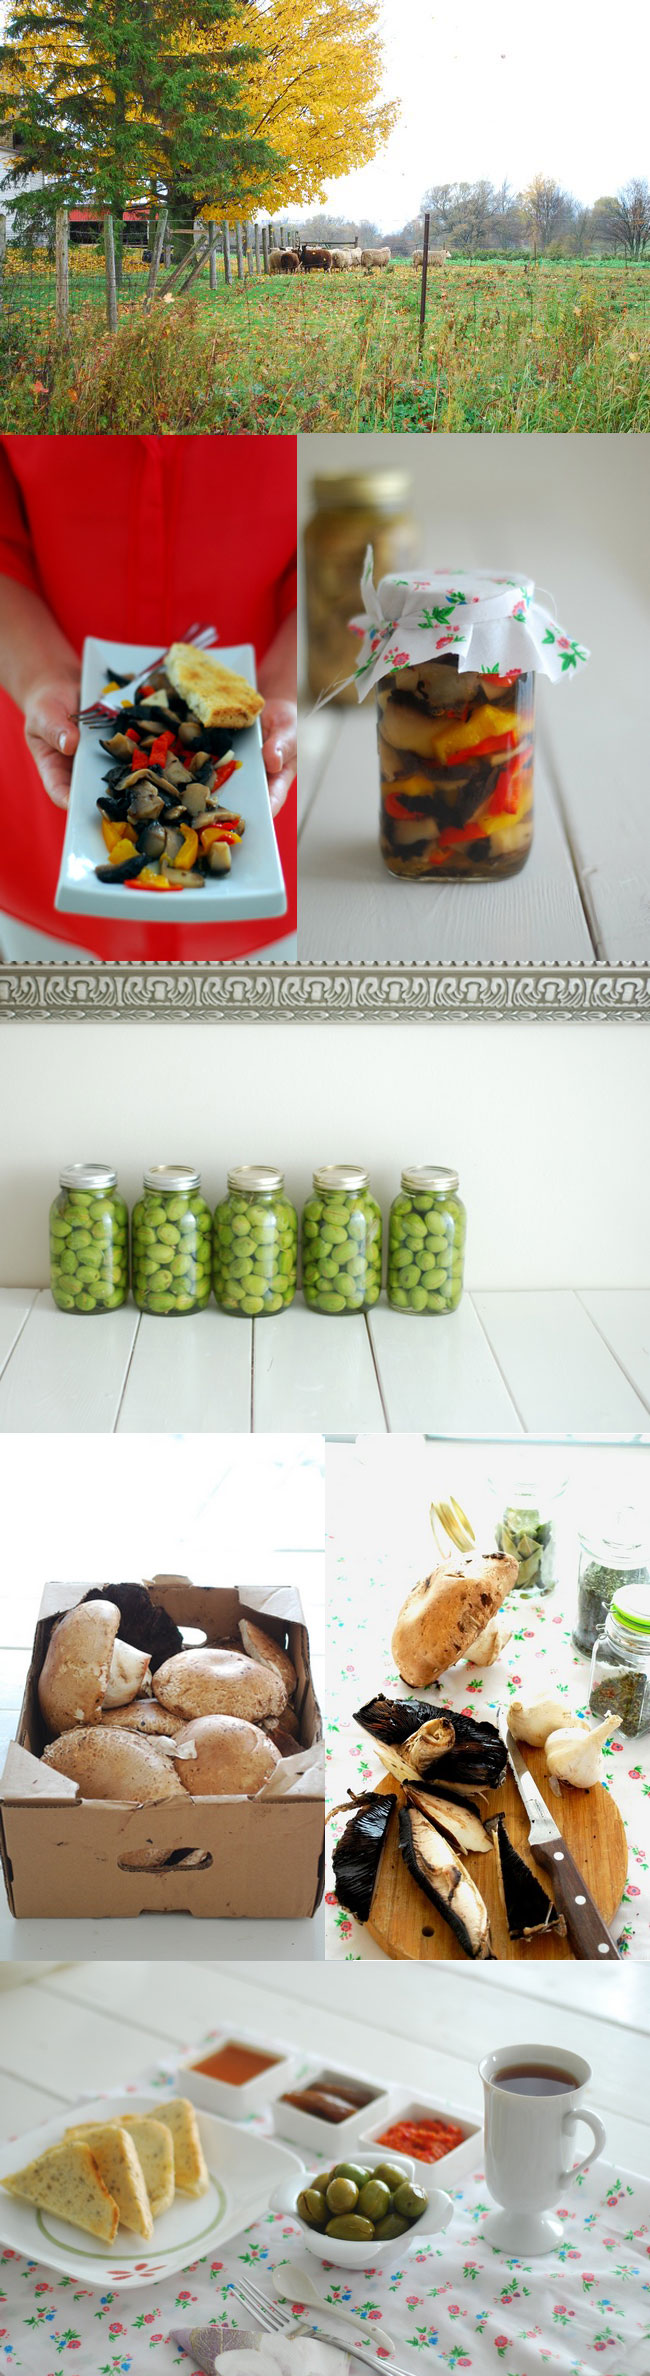 mantar konserve zeytin graten (3)